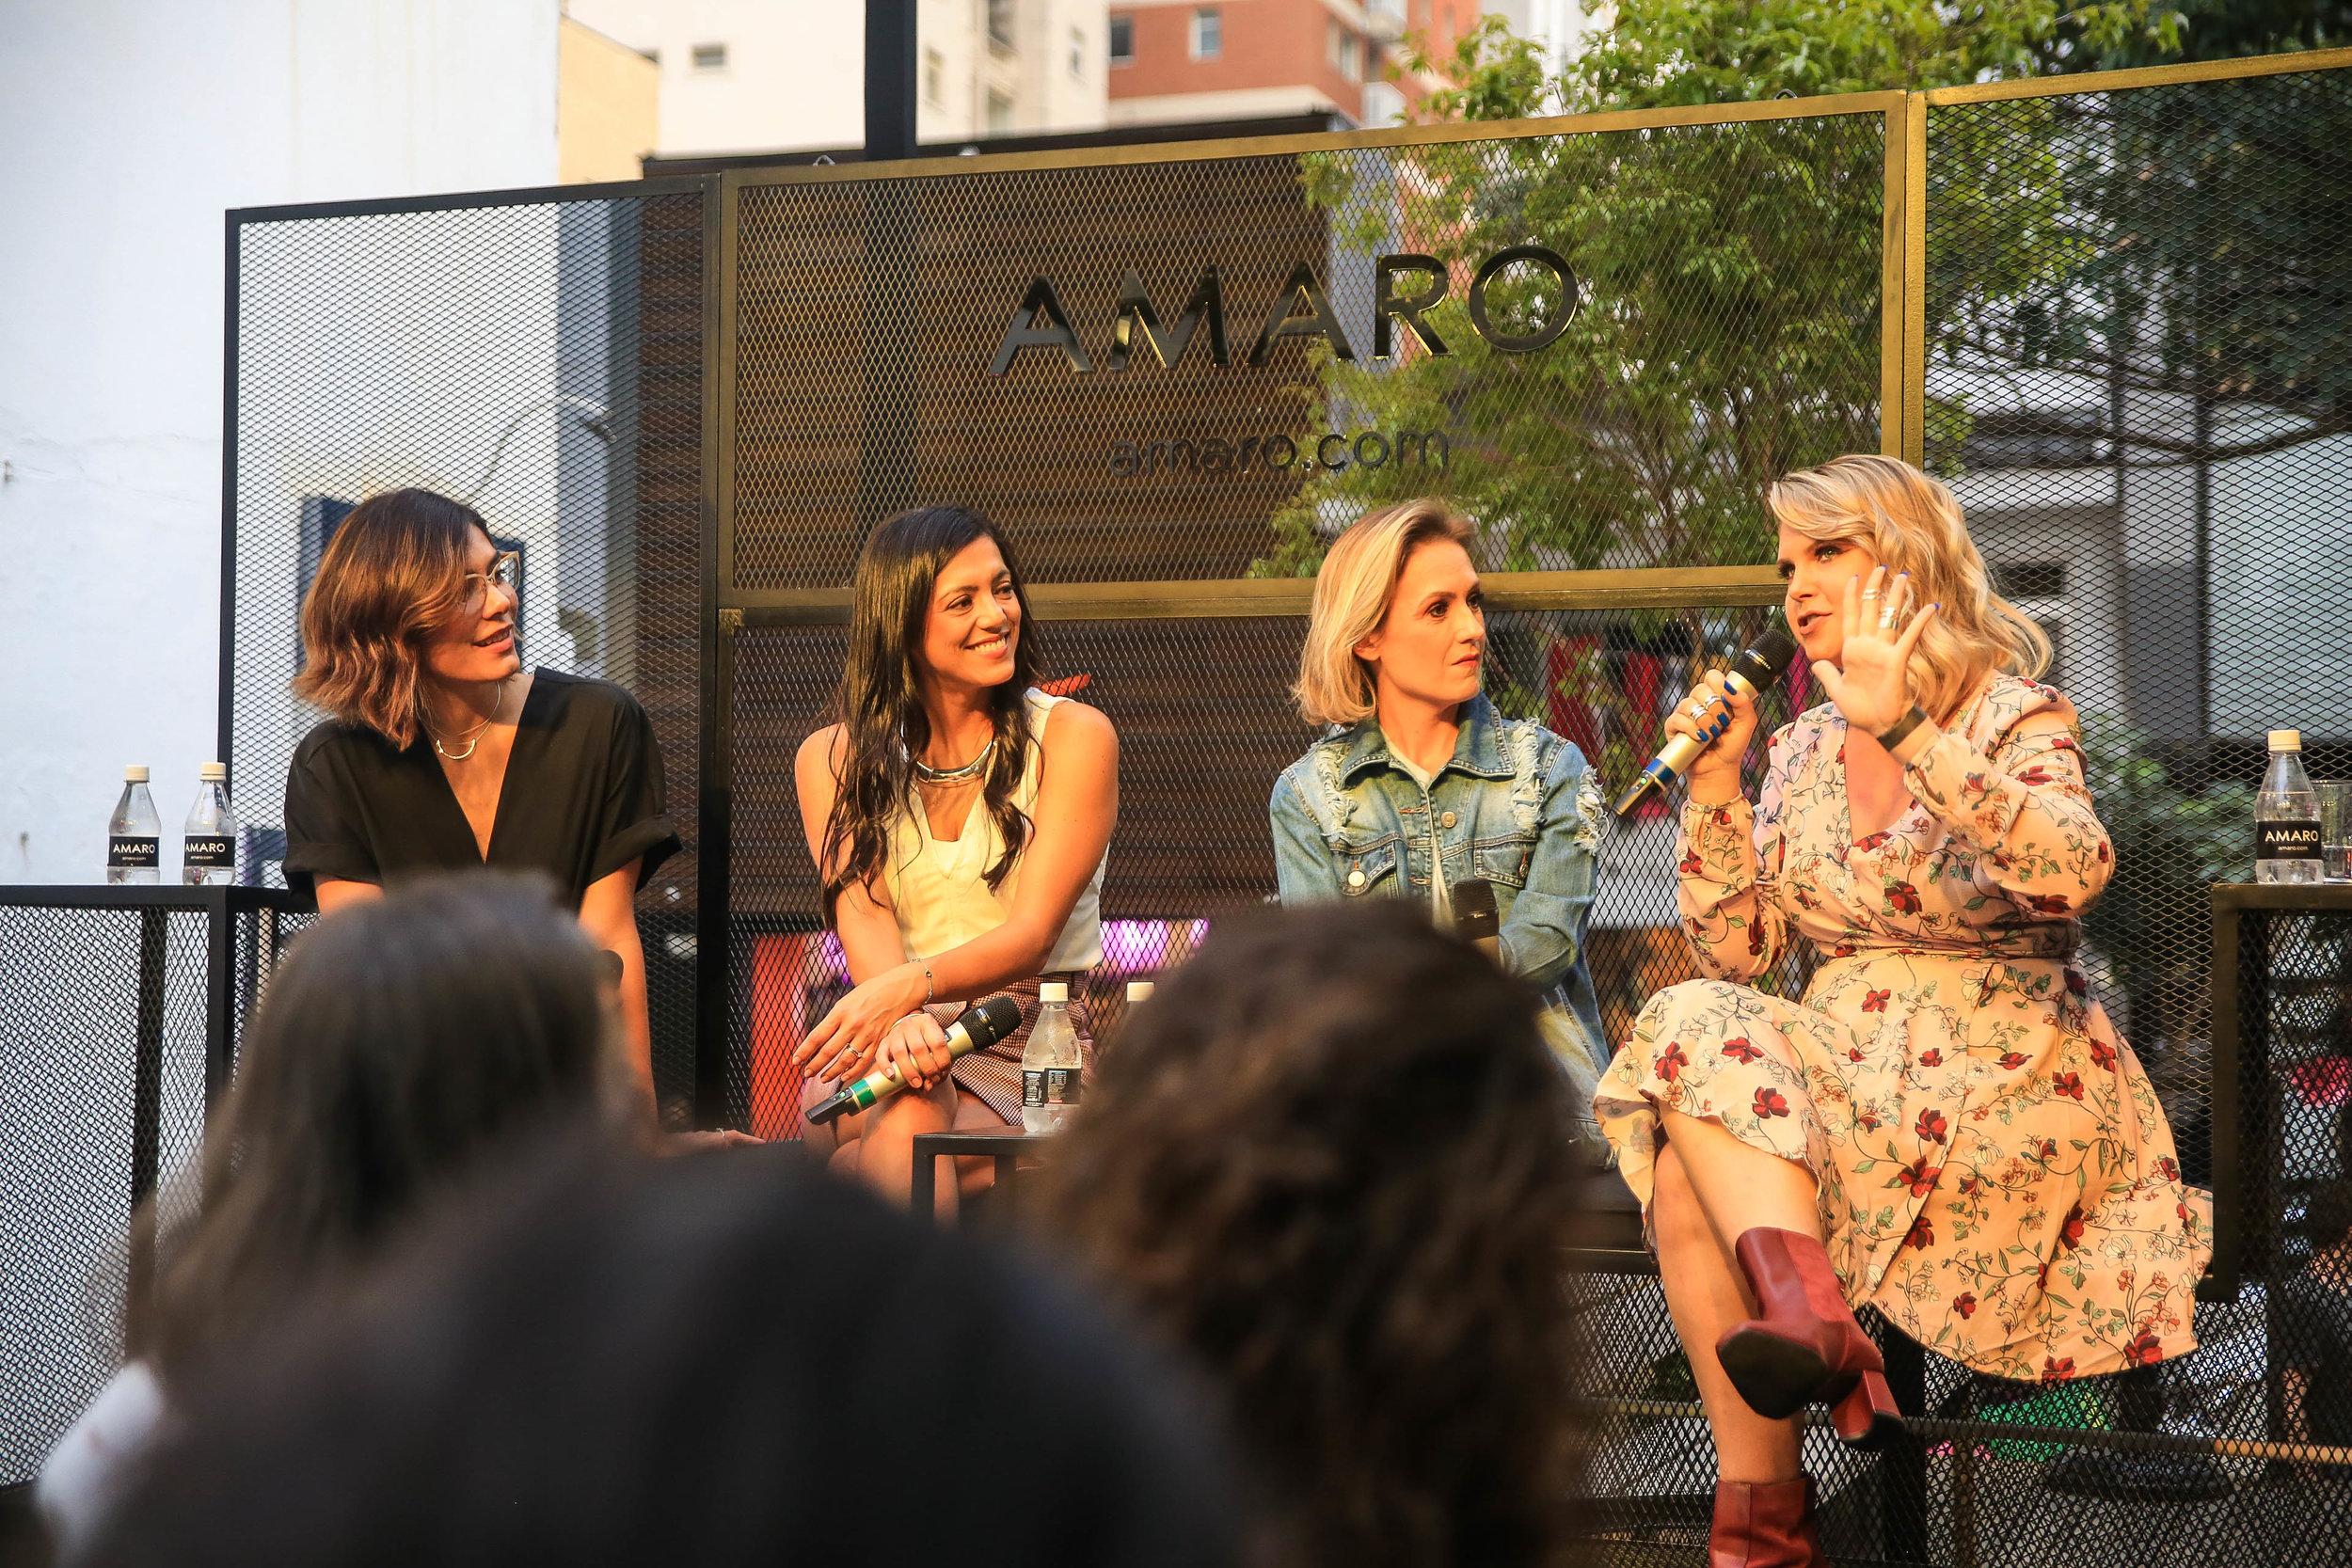 Laura Ancona, Denise Door, Shirley Hilgert e Carolinie Figueiredo durante o talk